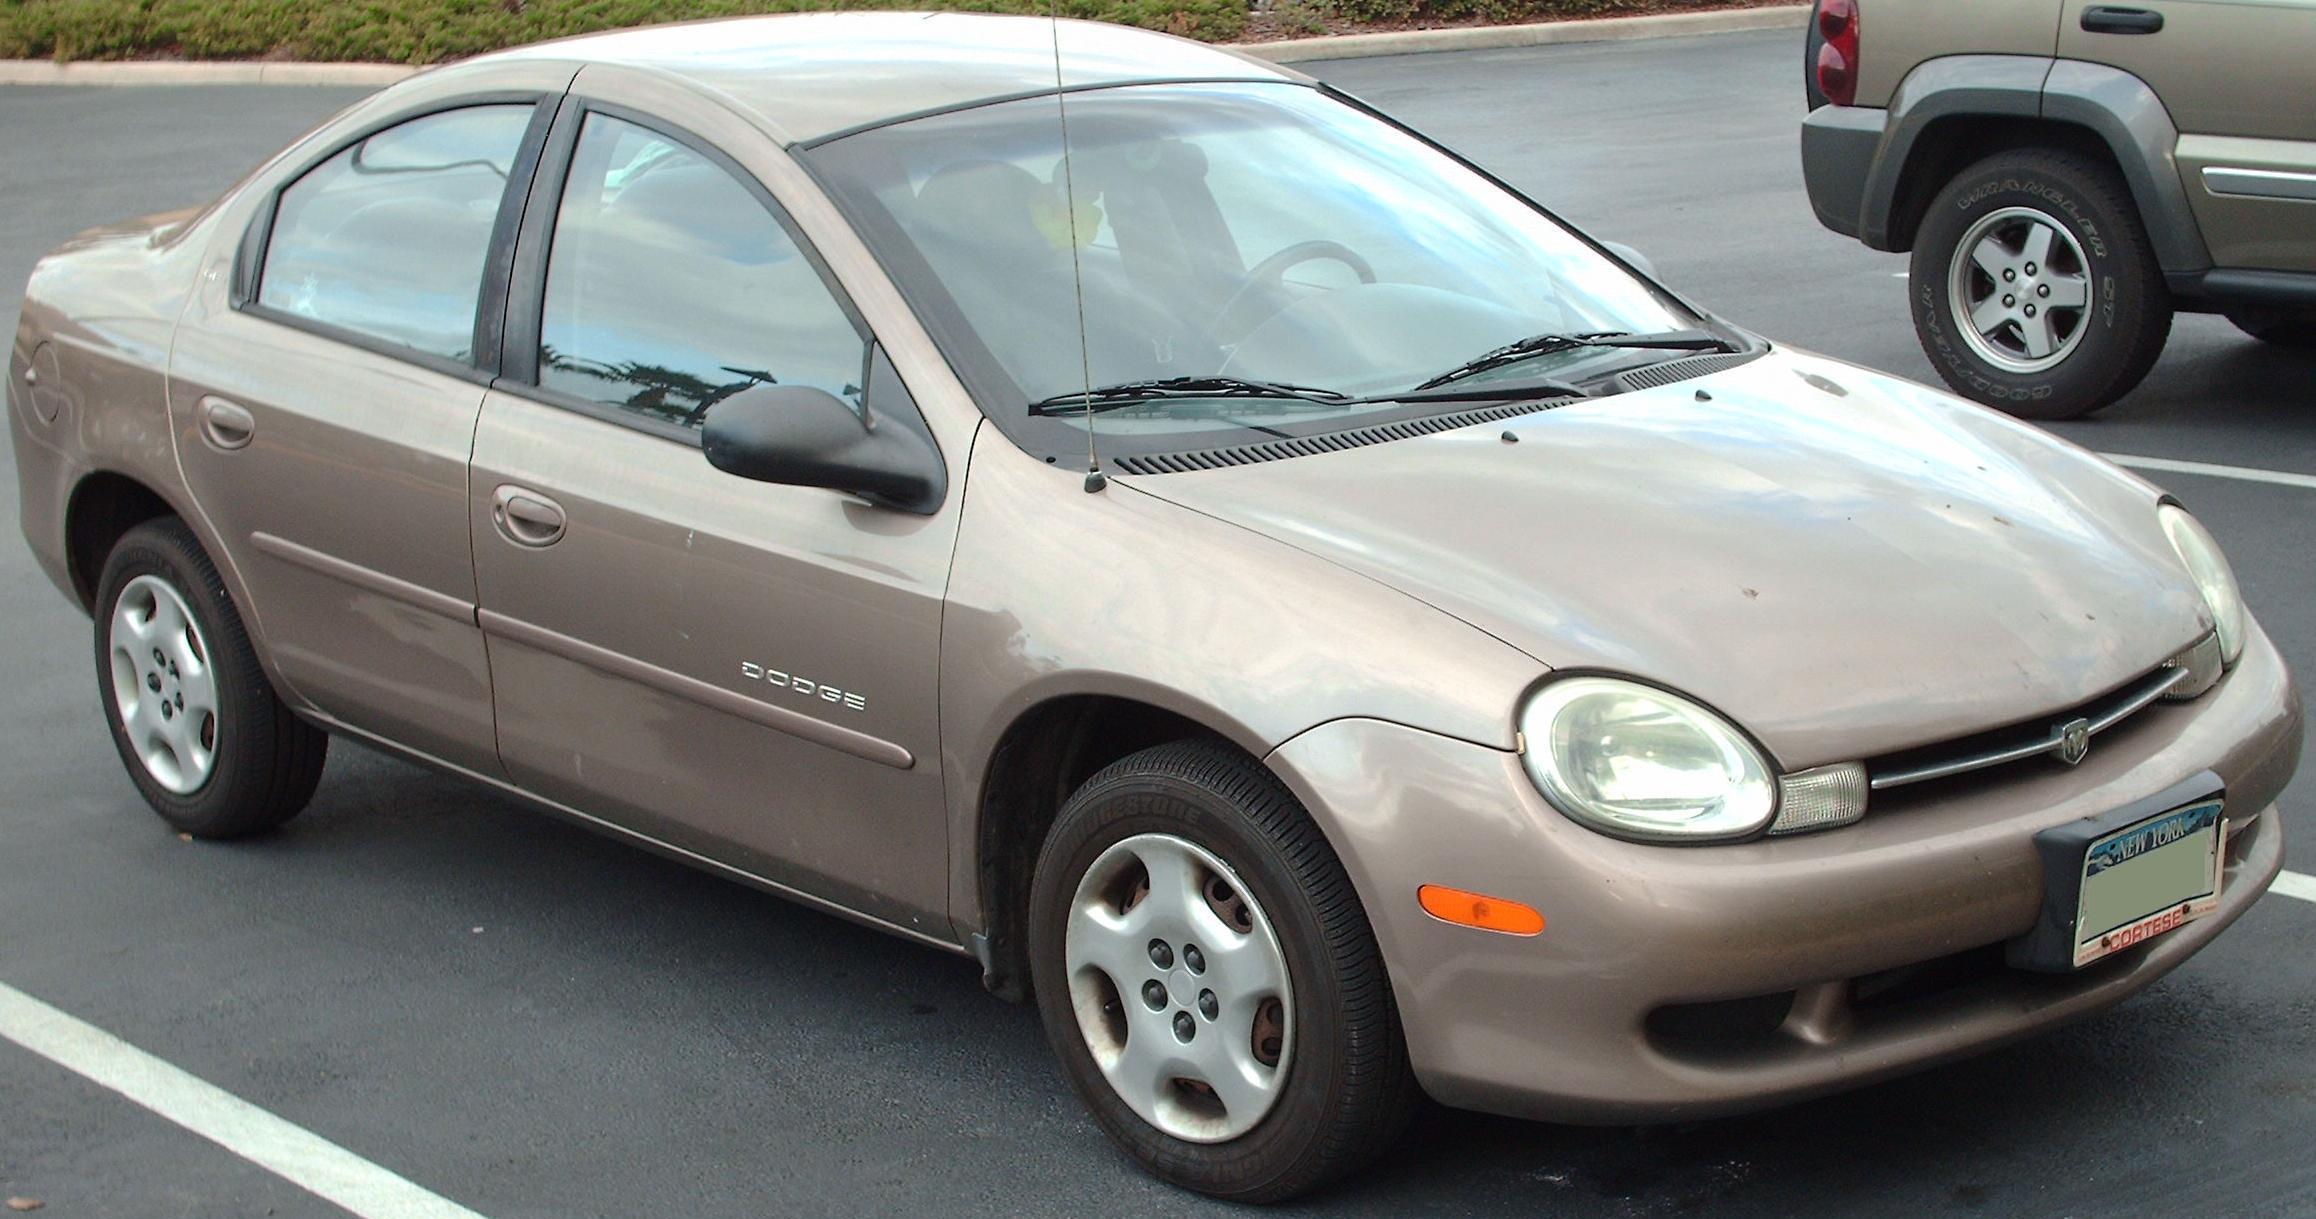 File:'00-'01 Dodge Neon.jpg - Wikimedia Commons